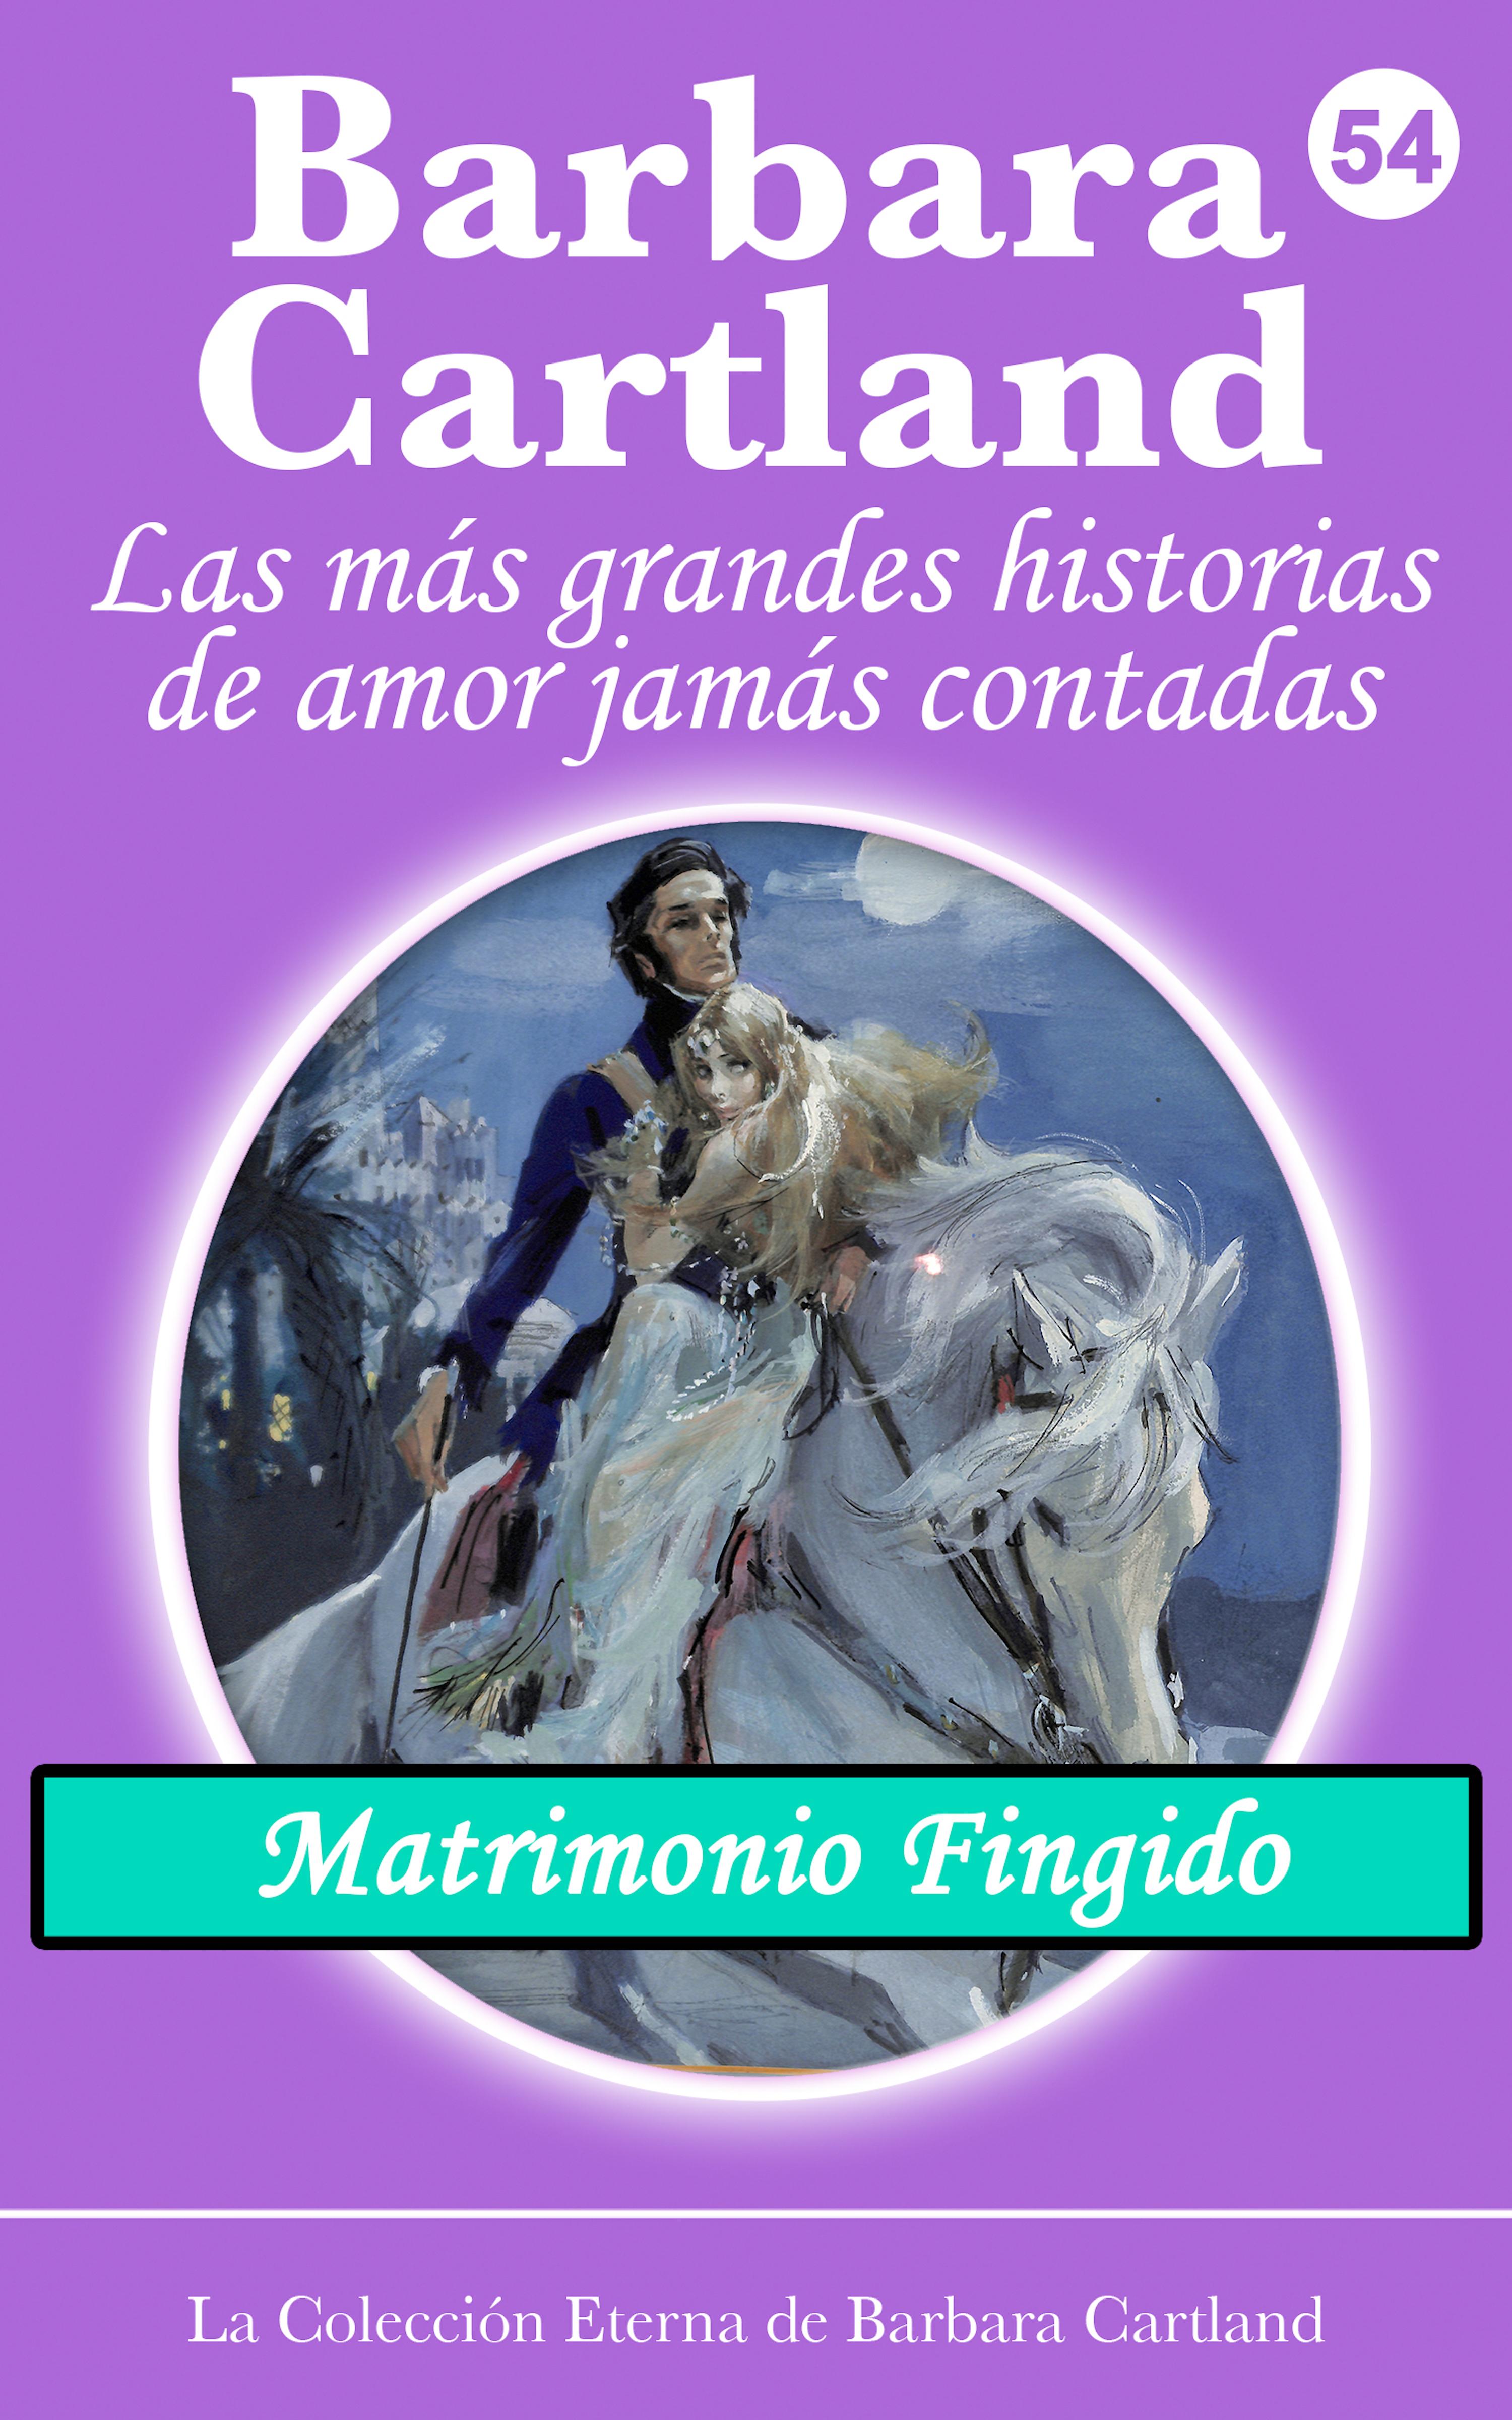 Barbara Cartland Matrimonio Fingido cartland barbara keelatud armastus